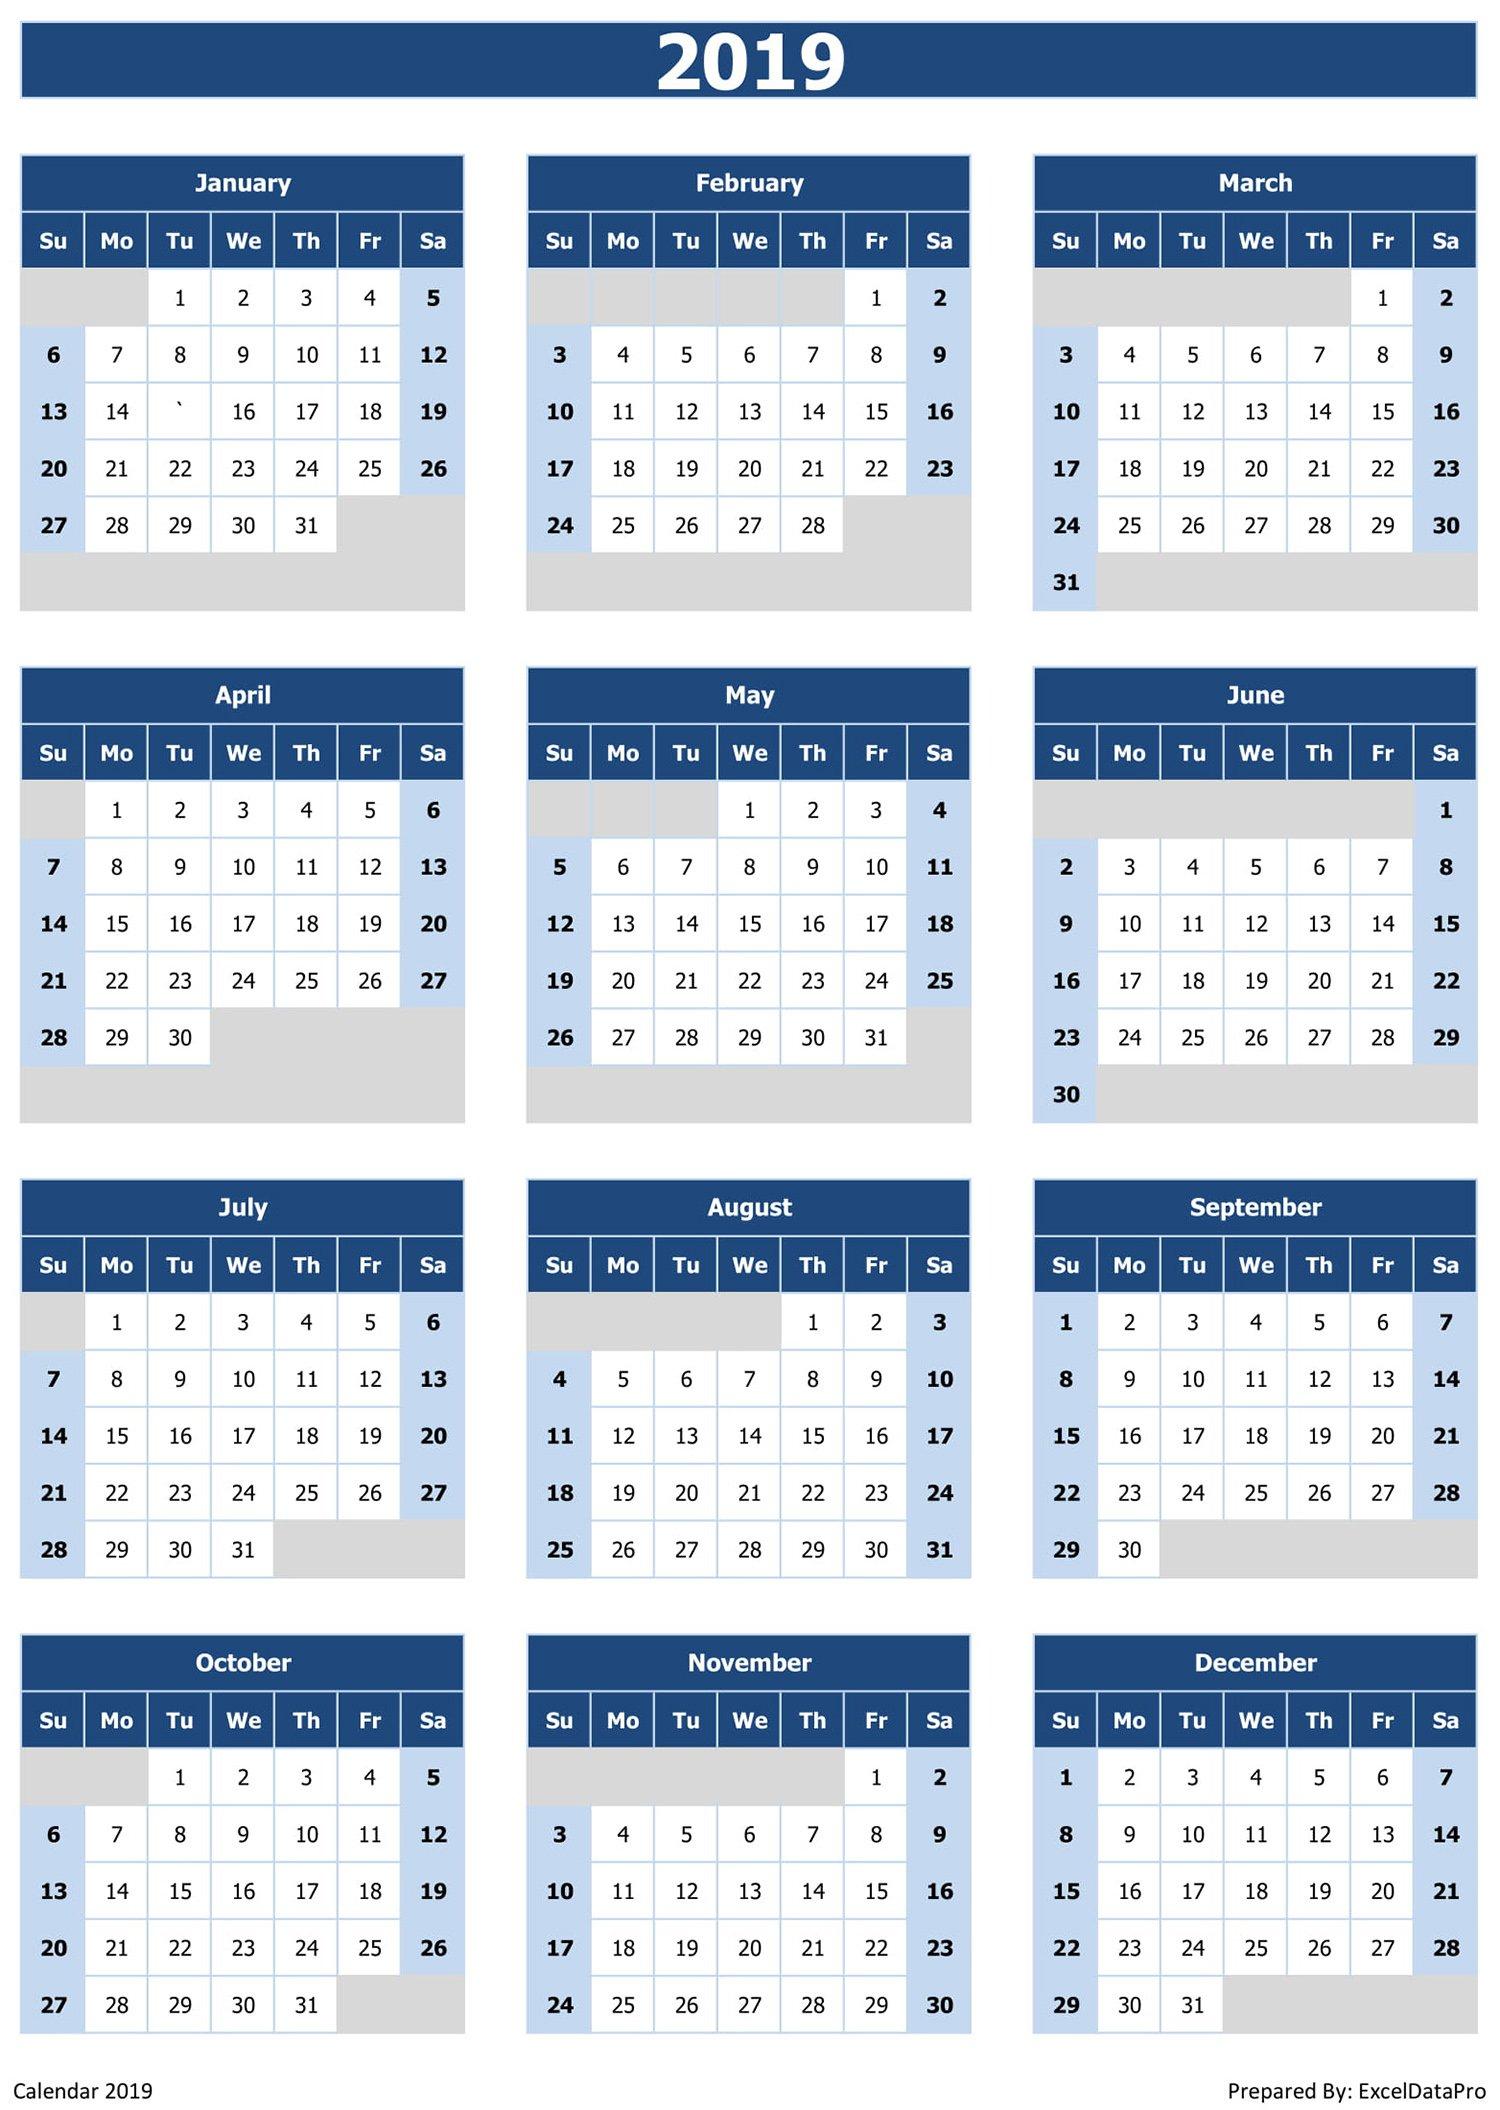 2019 Calendar Excel Templates, Printable Pdfs & Images - Exceldatapro Calendar 2019 View